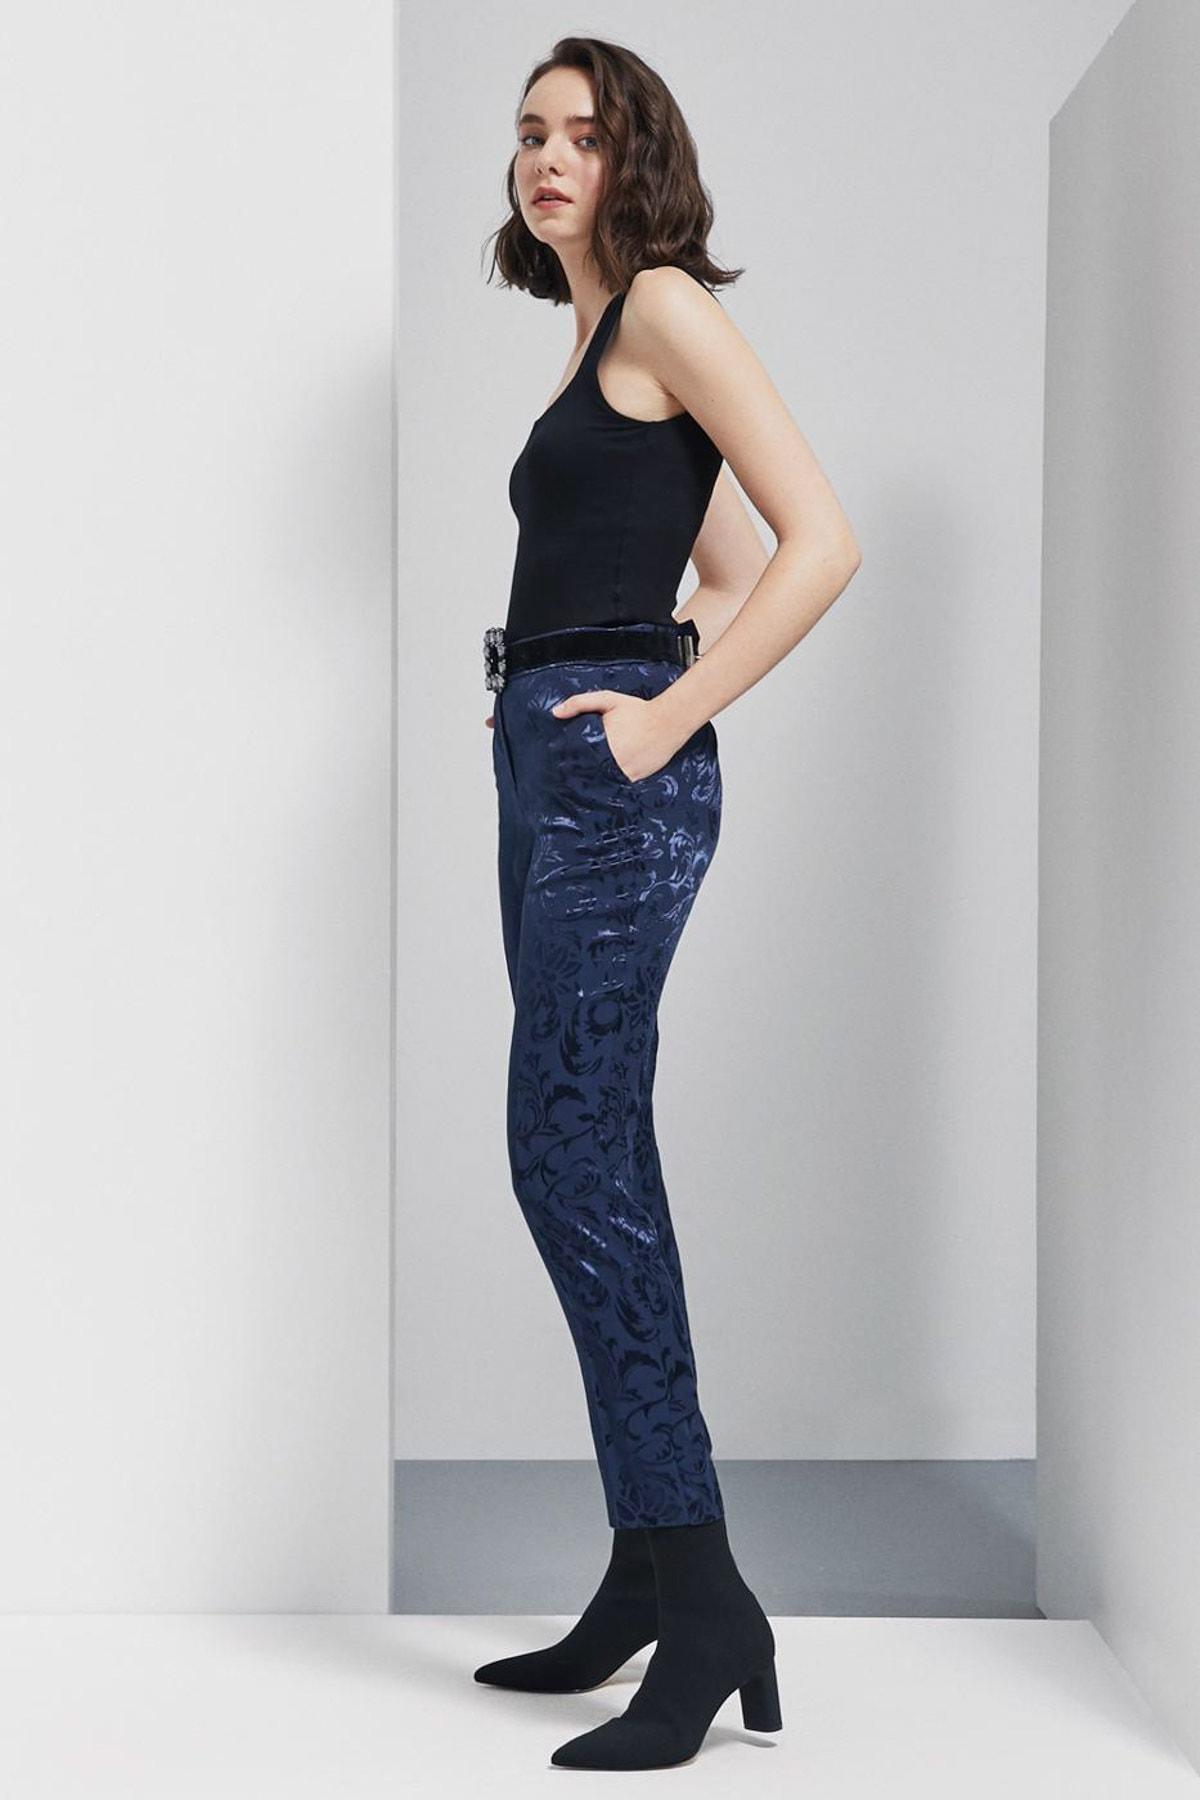 Perspective Kadın Lacivert Pantolon 92051113|339 2